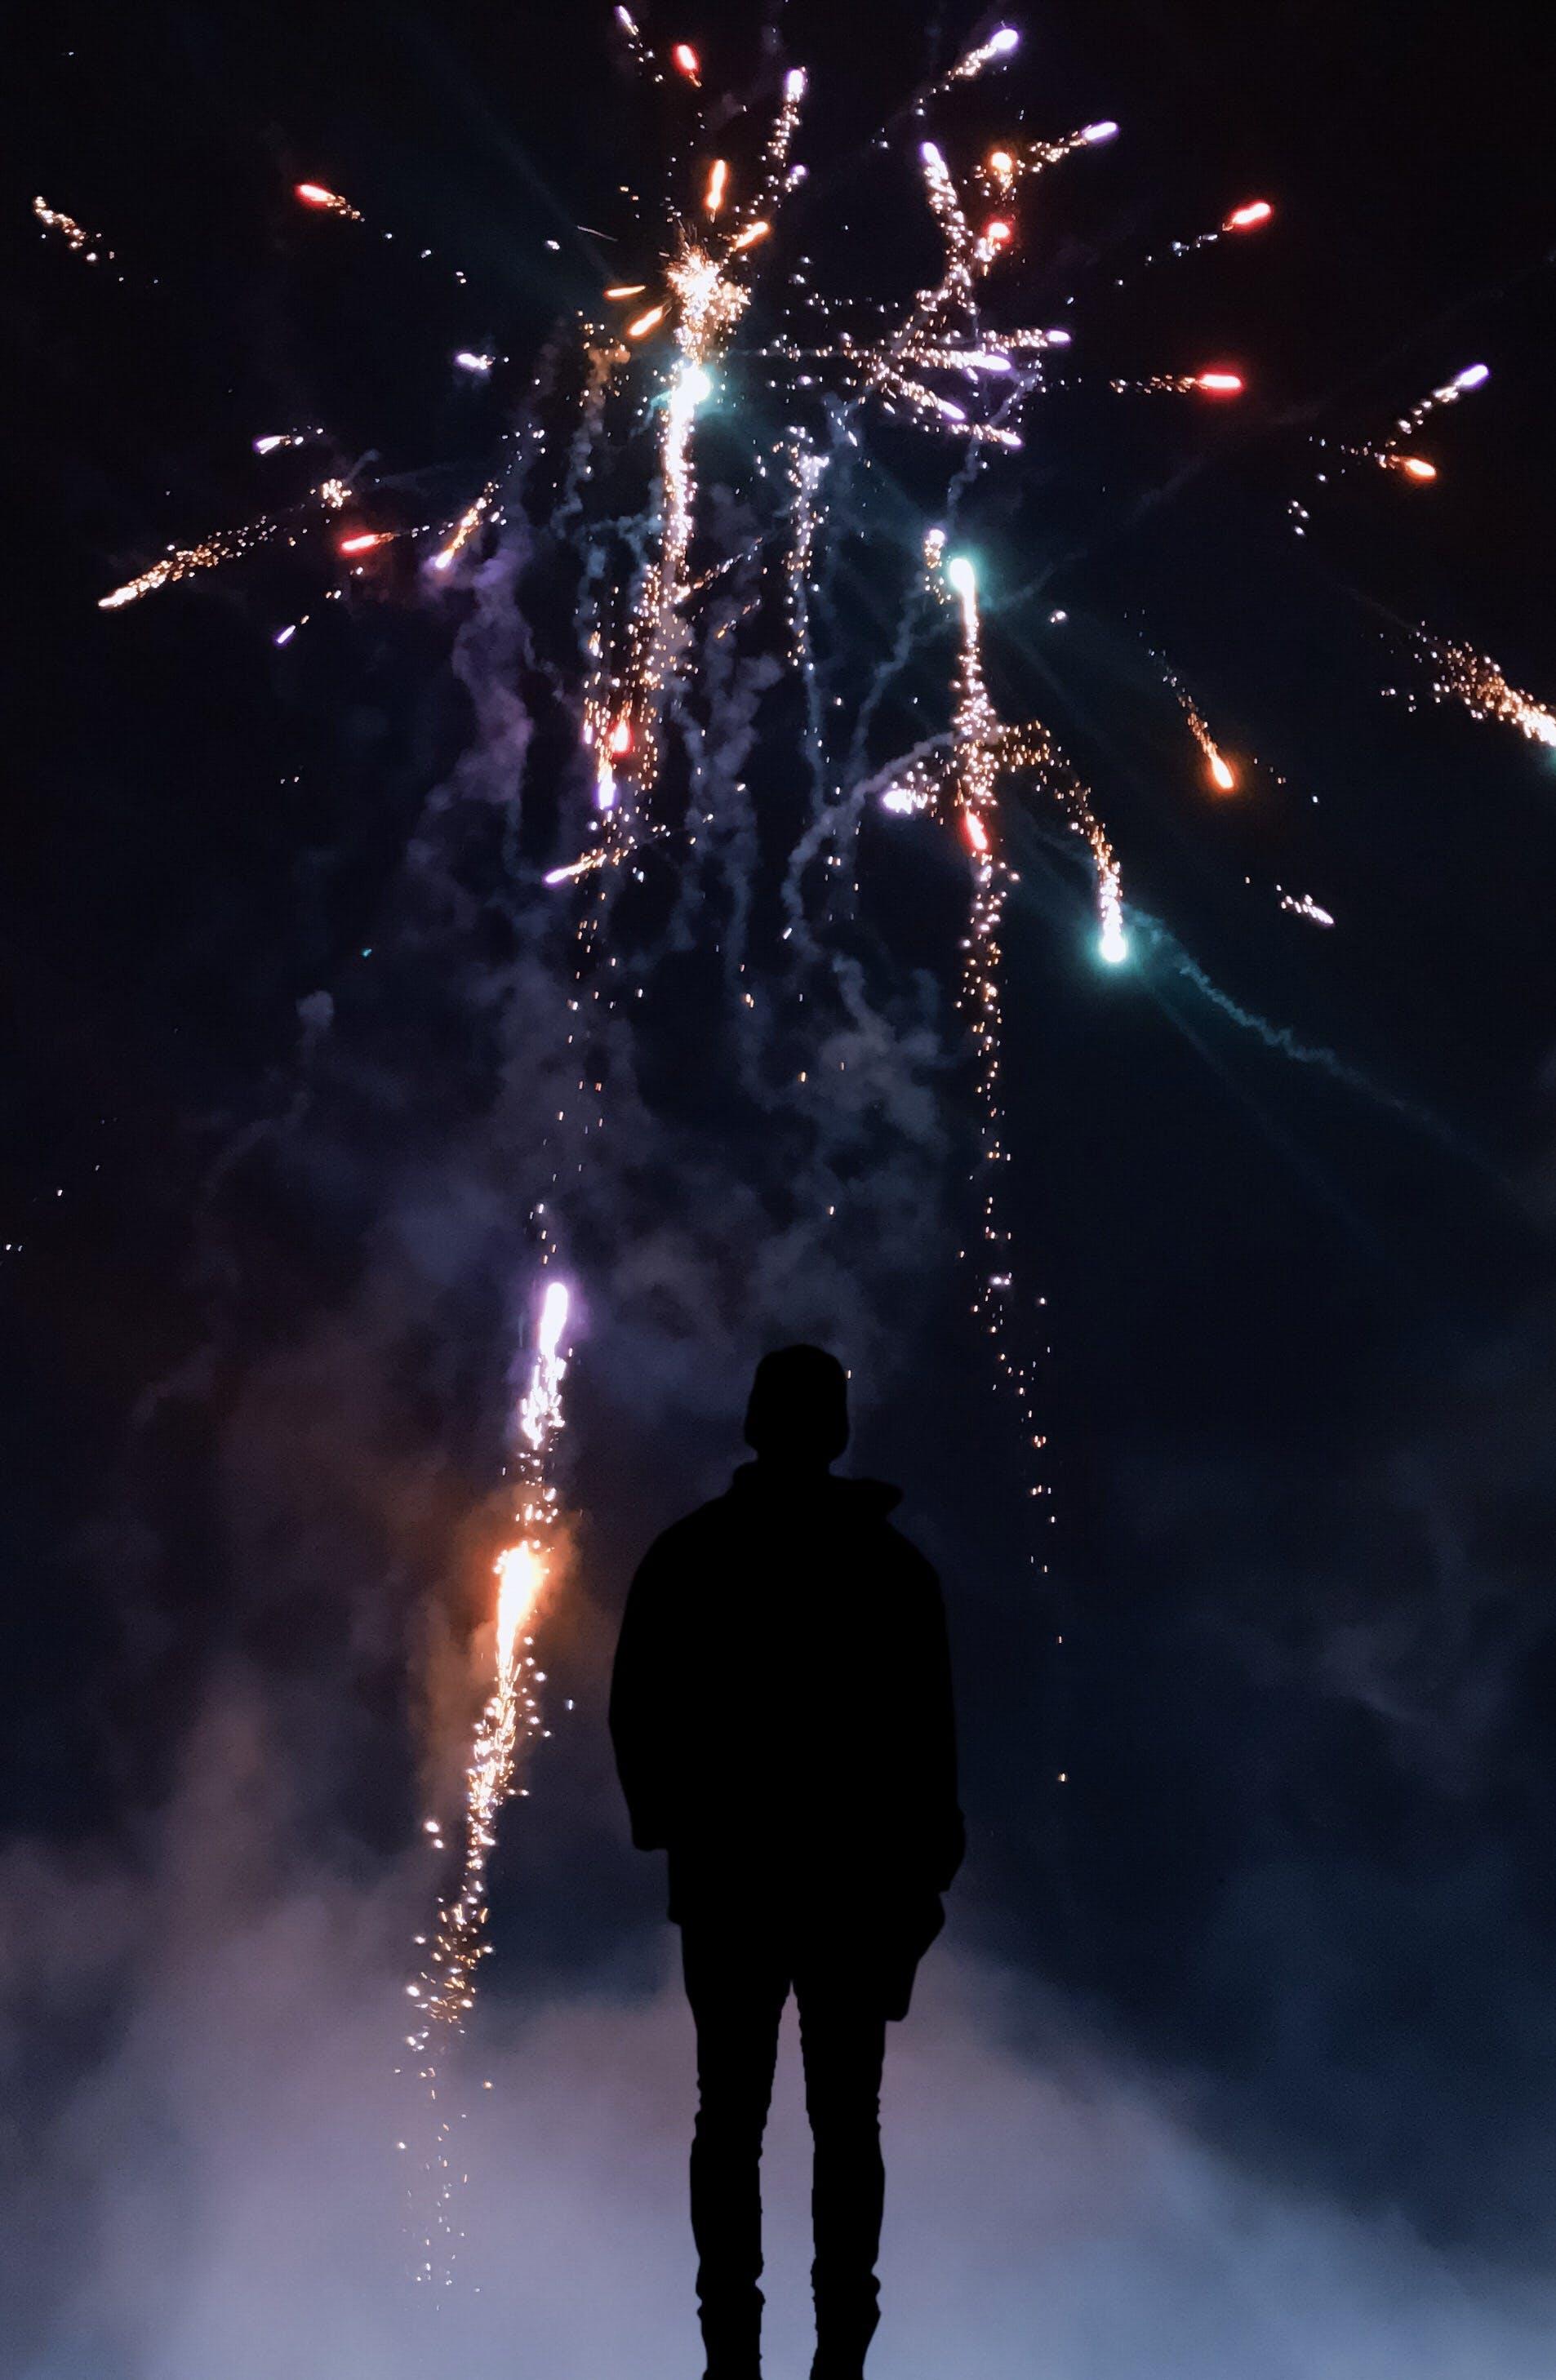 Kostenloses Stock Foto zu dunkel, dunkler himmel, farbiger rauch, feier